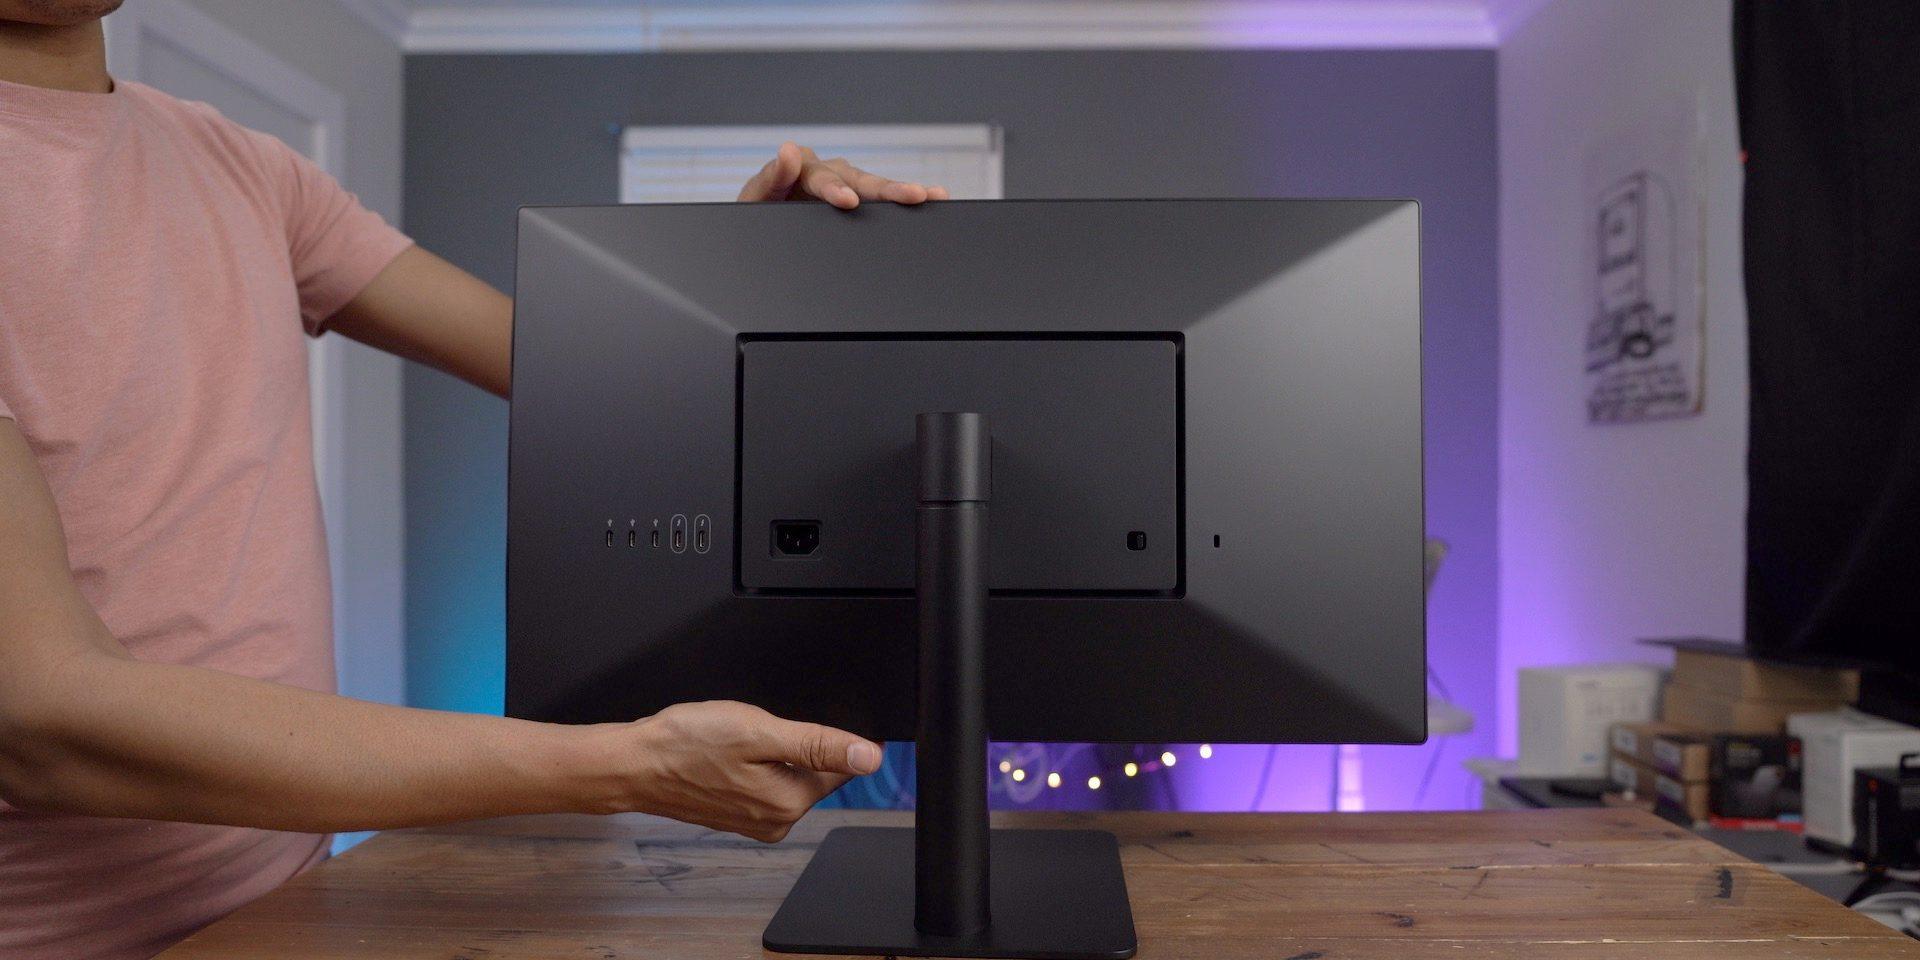 "<span href=""https://9to5mac.com/2019/05/24/lg-ultrafine-display-review-2019-two-thunderbolt-3-ports-video/"">Review: 23.7 pulgadas LG Ultra fino de la Pantalla – una carga más rápida, y dos Thunderbolt 3 puertos [Video]</a>"